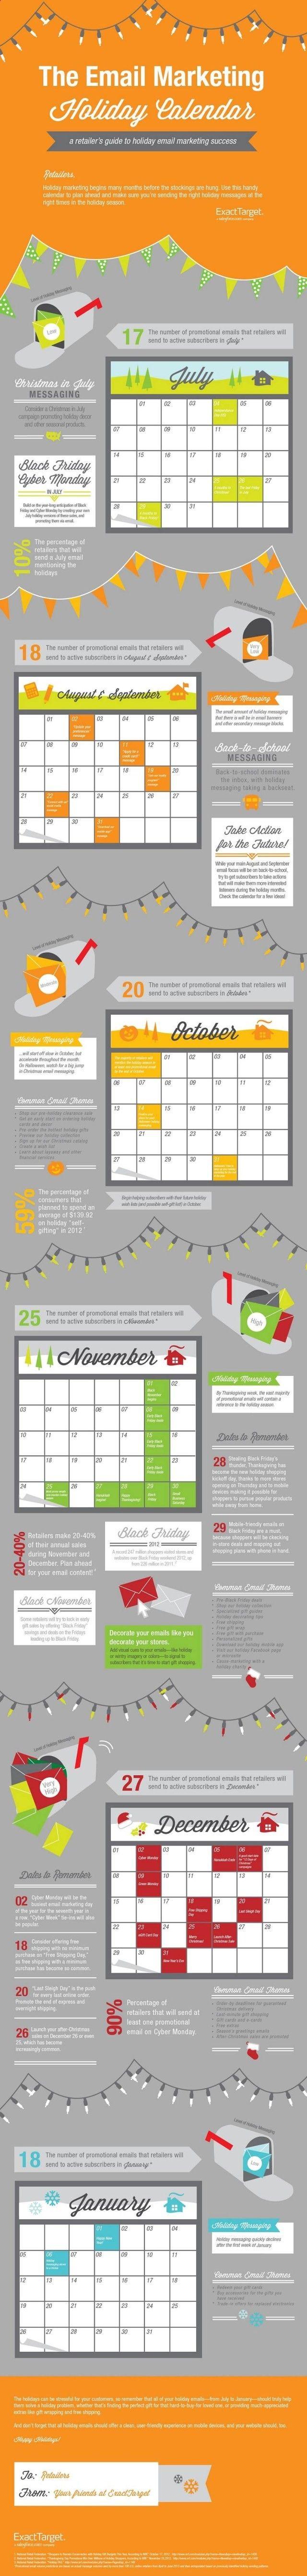 Email Marketing Holiday Calendar